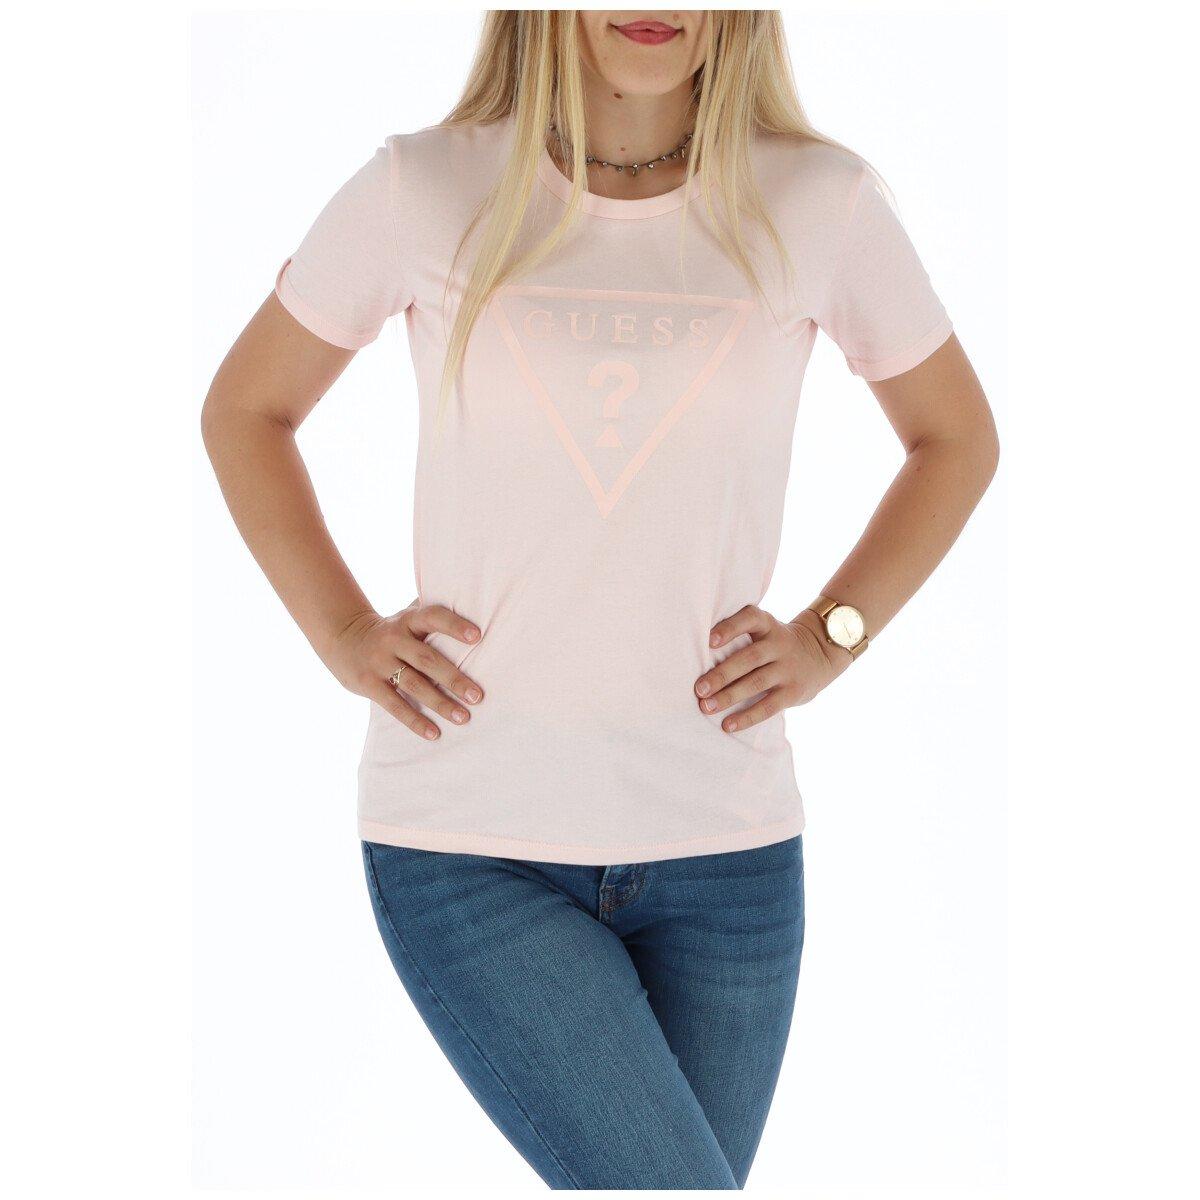 Guess Women's T-Shirt Pink 301096 - pink-1 XS